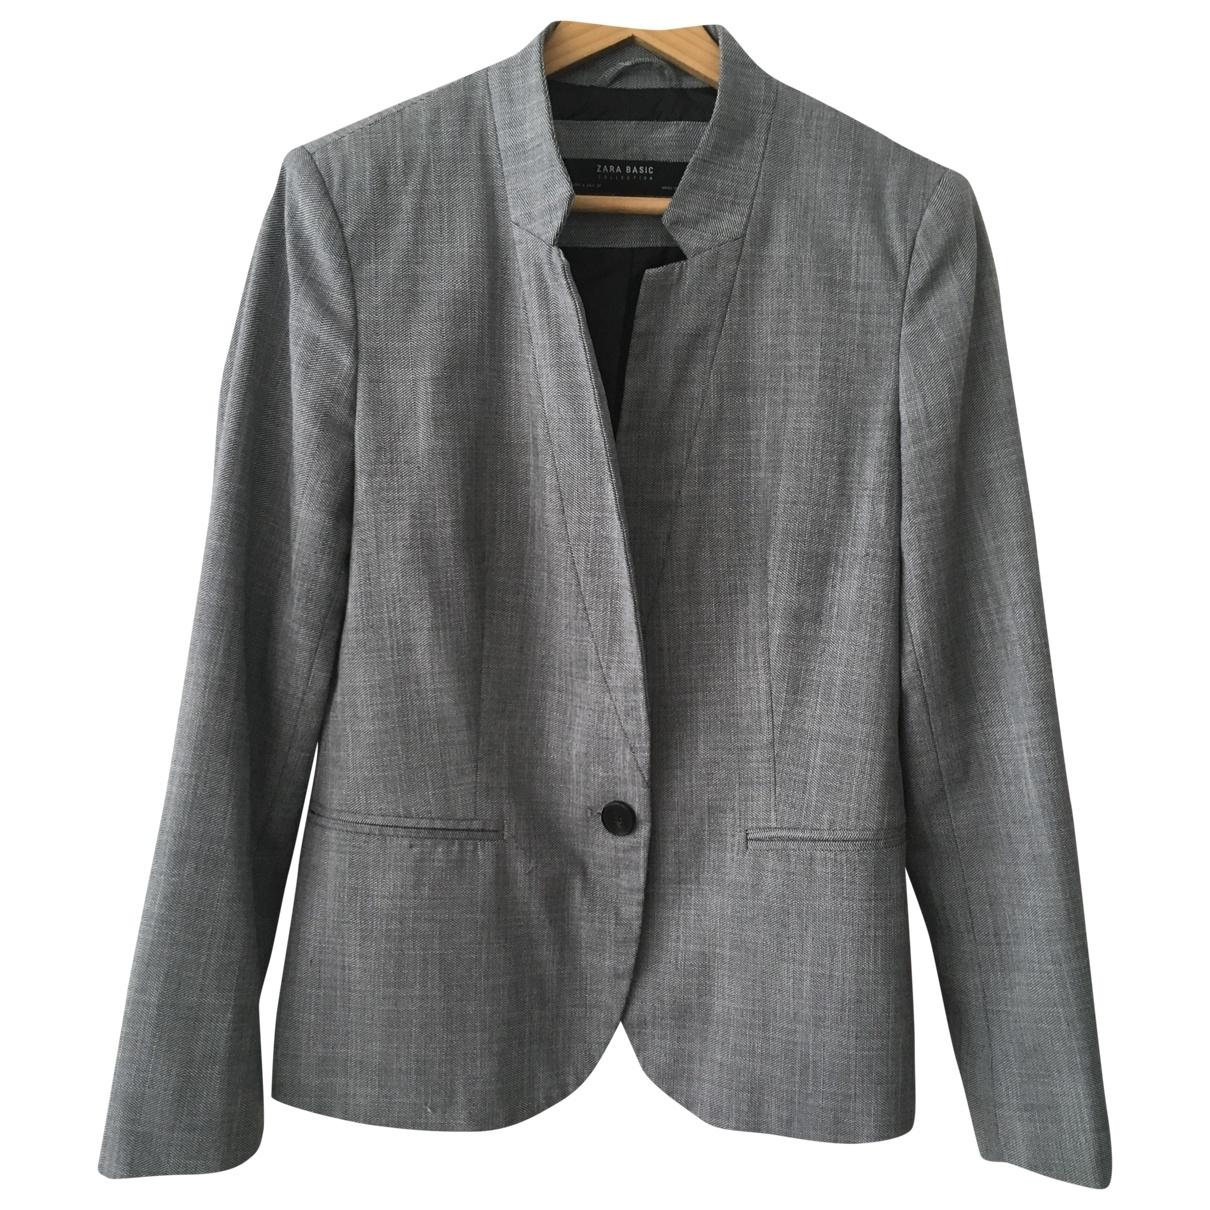 Zara \N Grey Cotton jacket for Women 40 FR